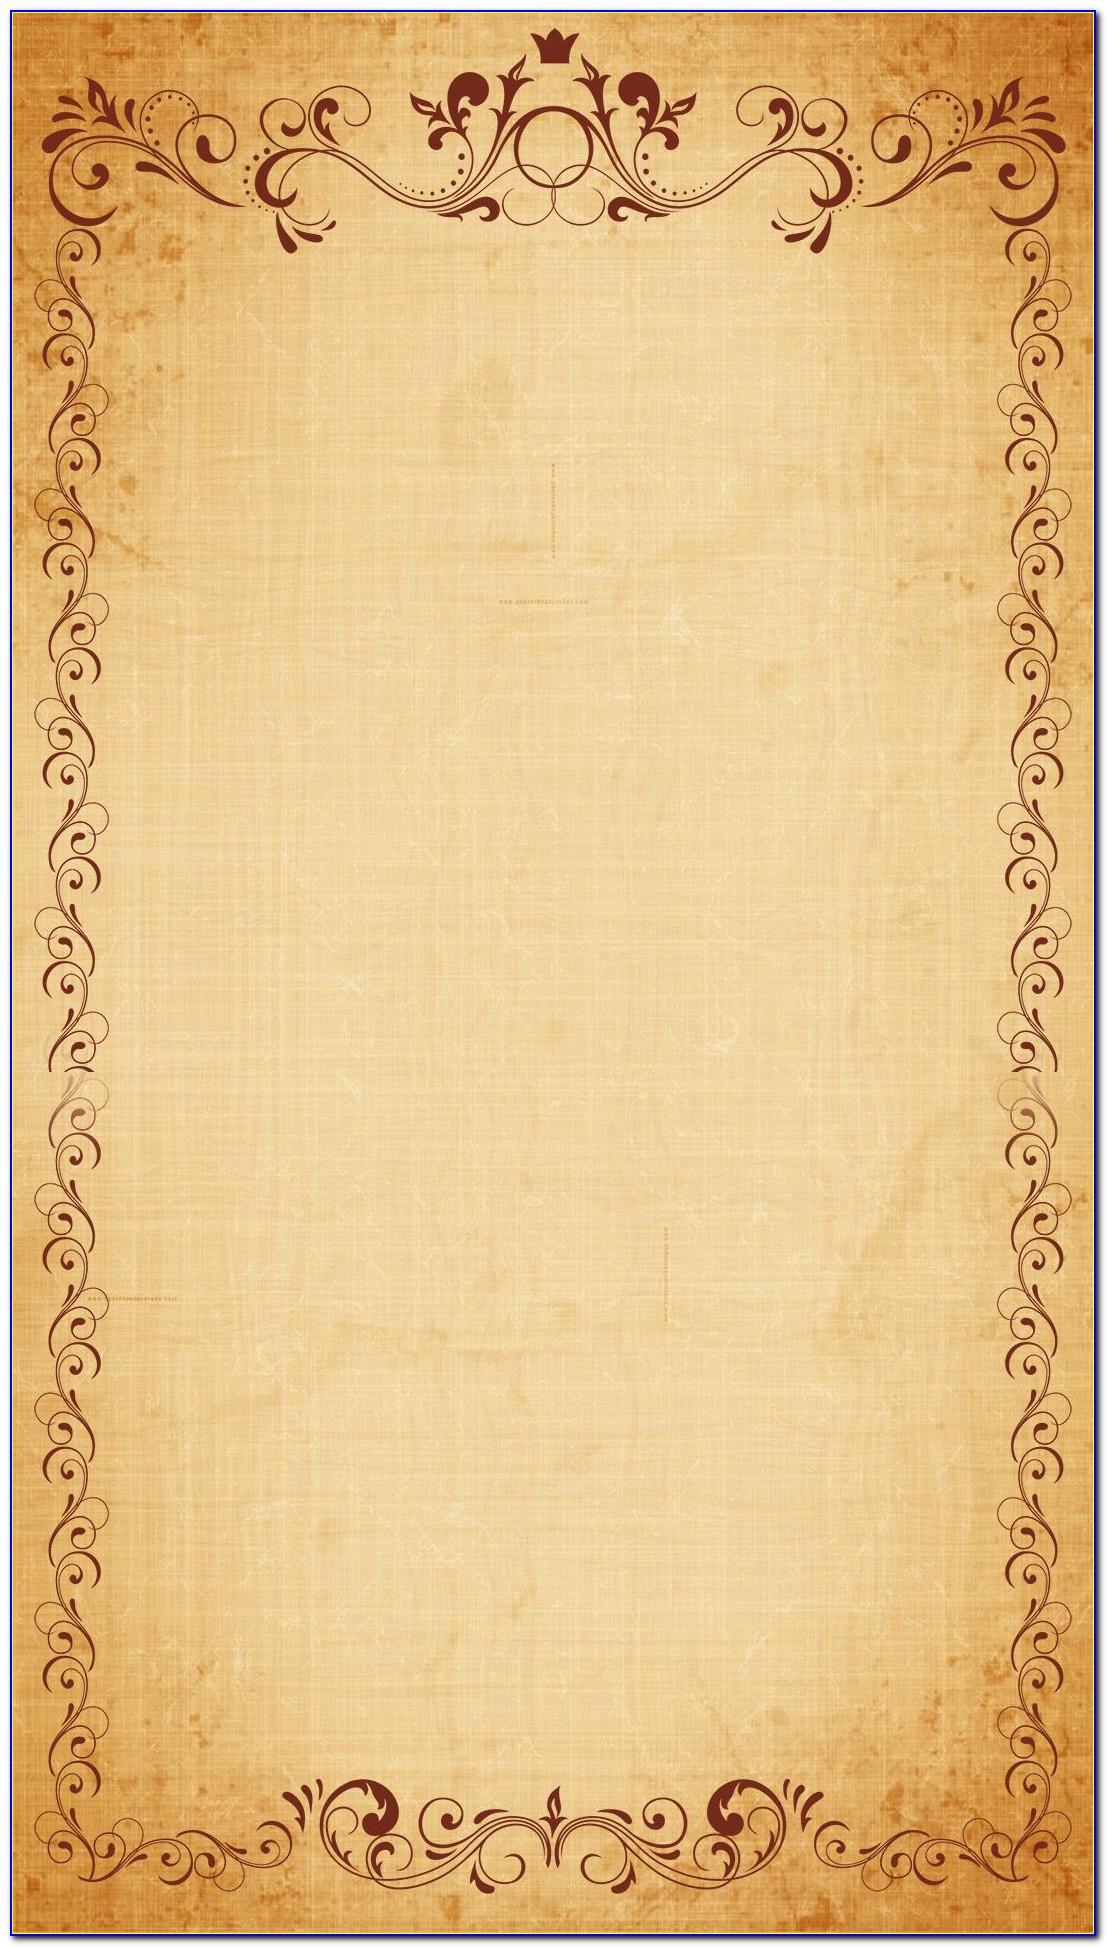 Wedding Card Border Design Download